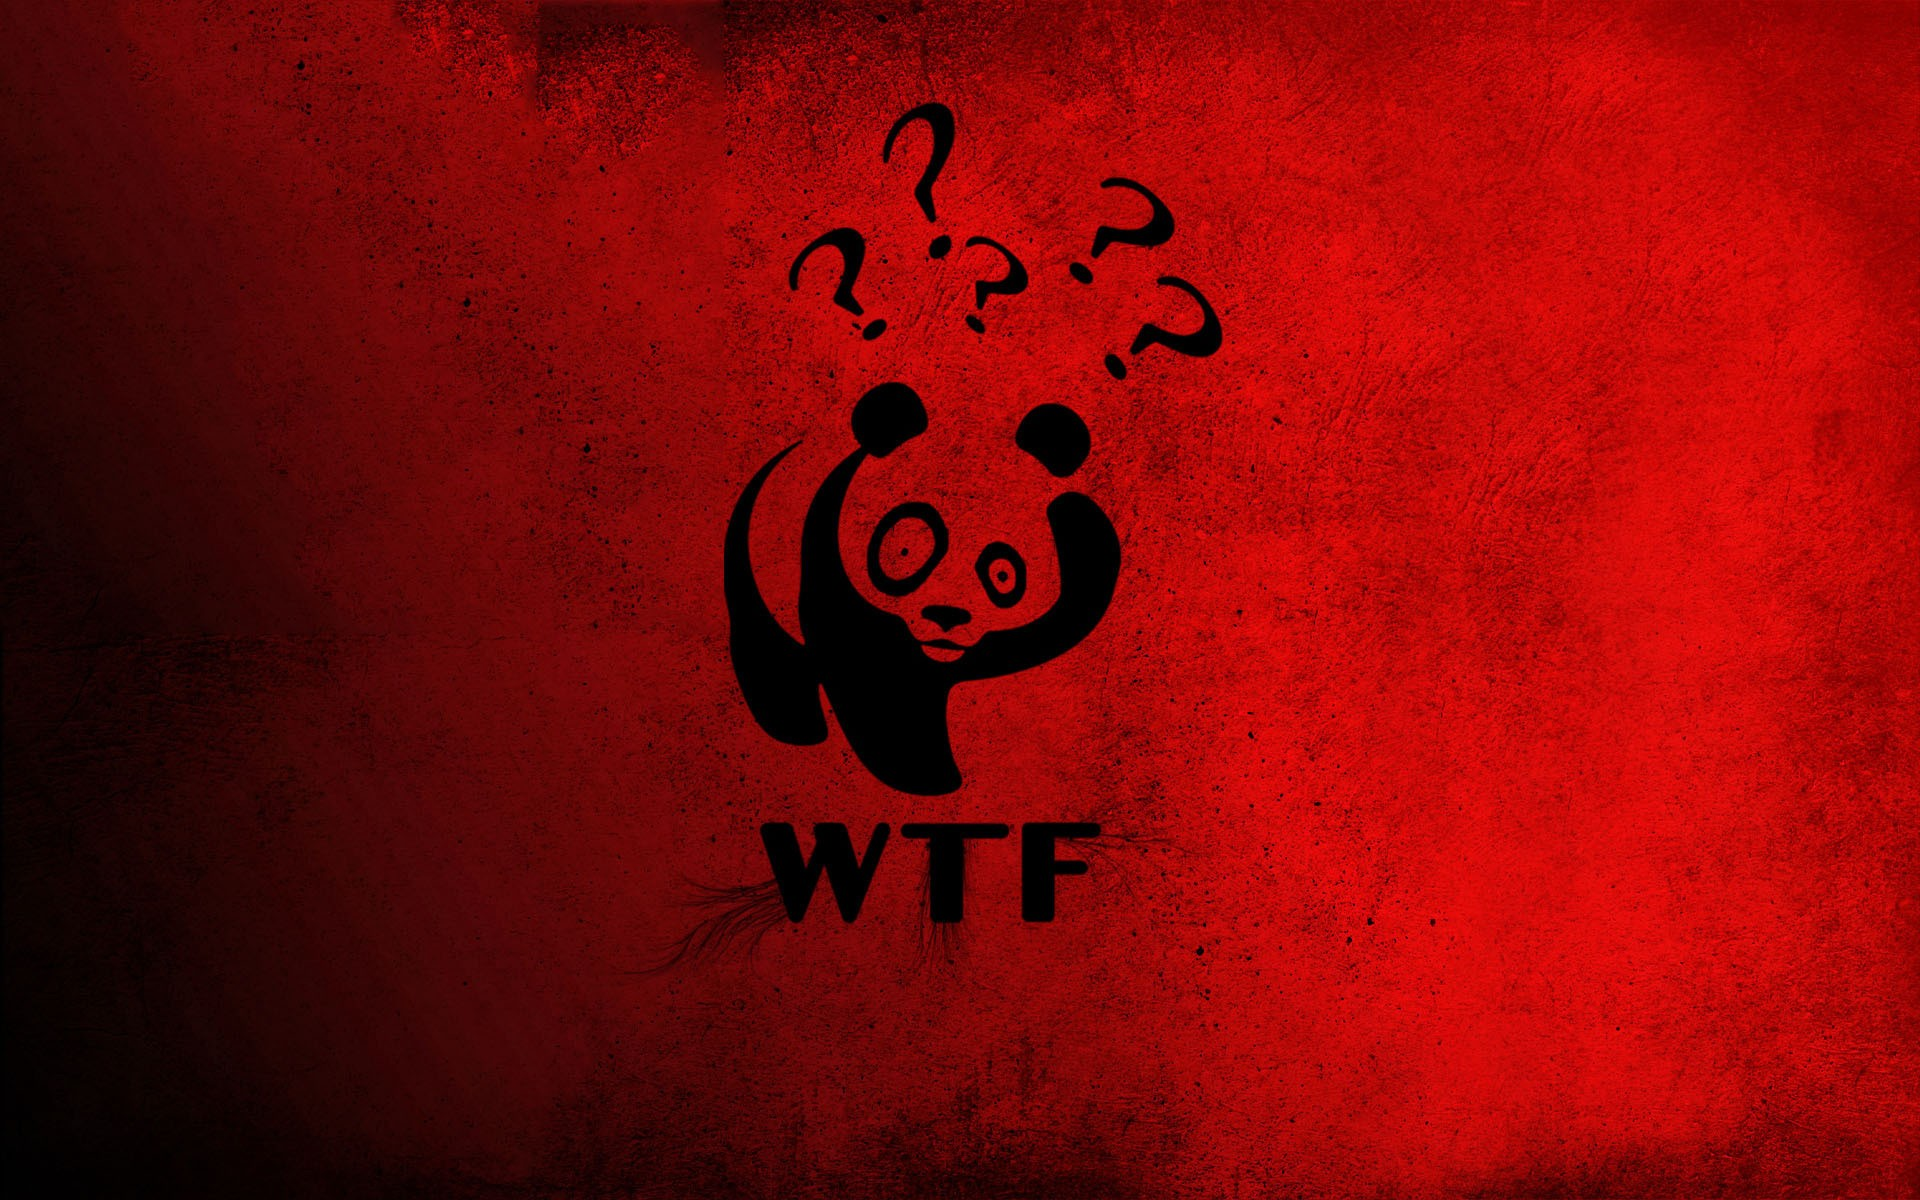 Wtf Panda Bears Wallpaper 1920x1200 14877 Wallpaperup